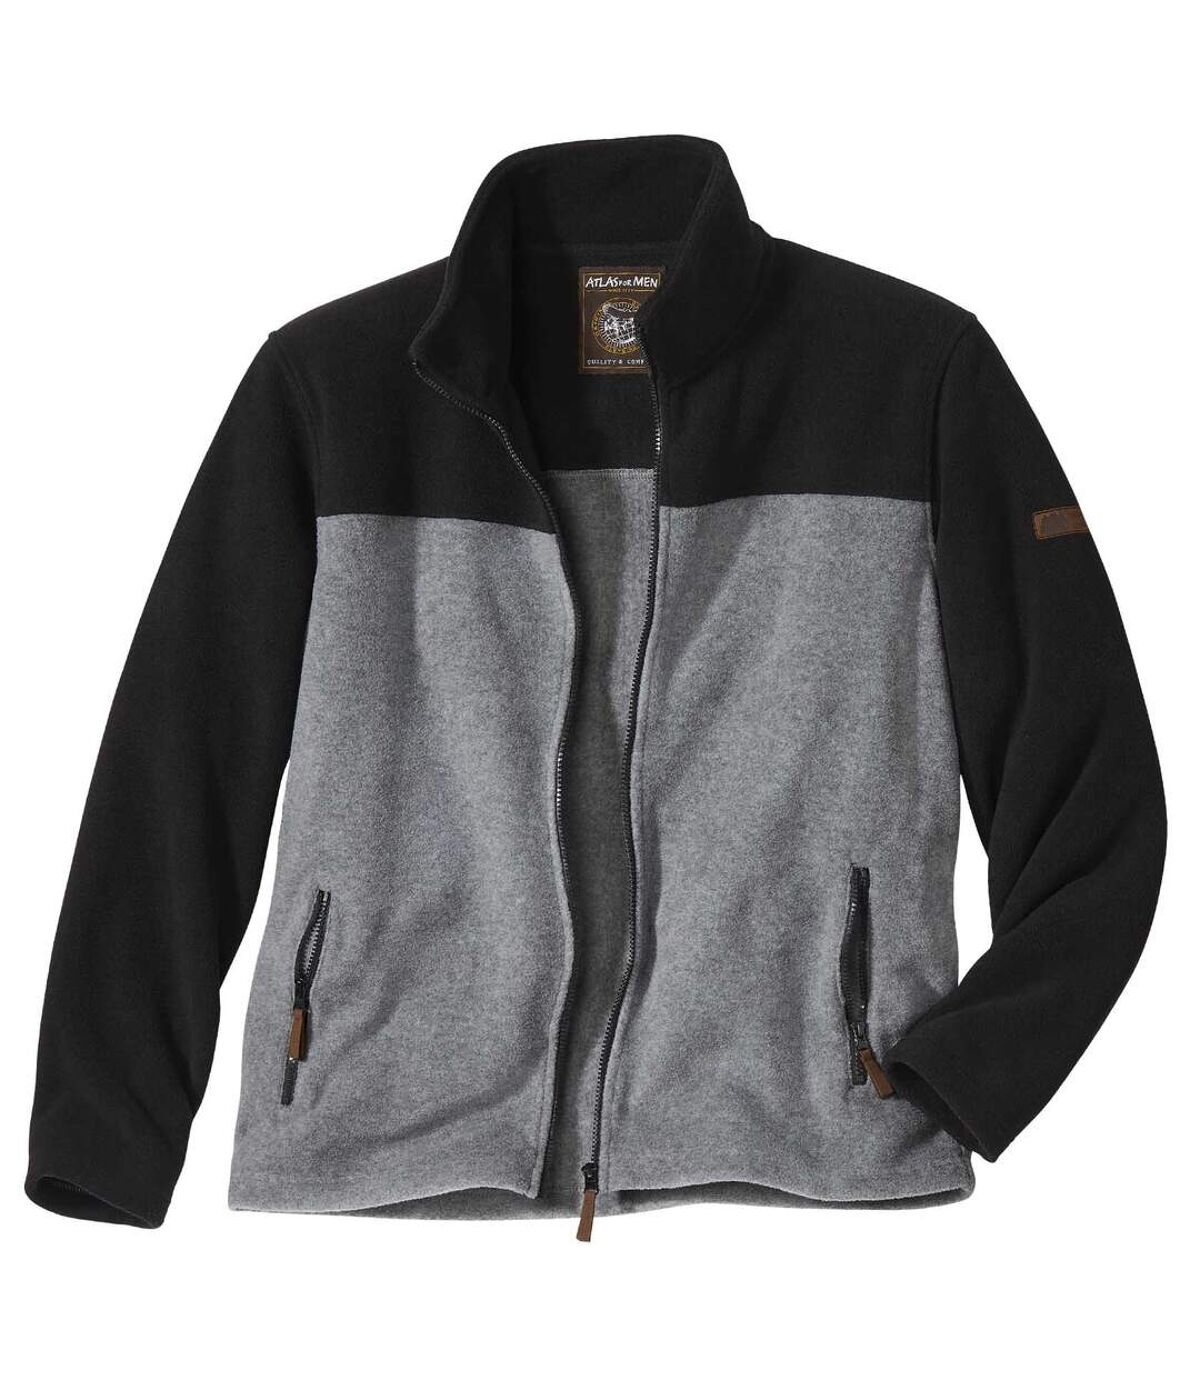 Outdoorová fleecová bunda Atlas For Men